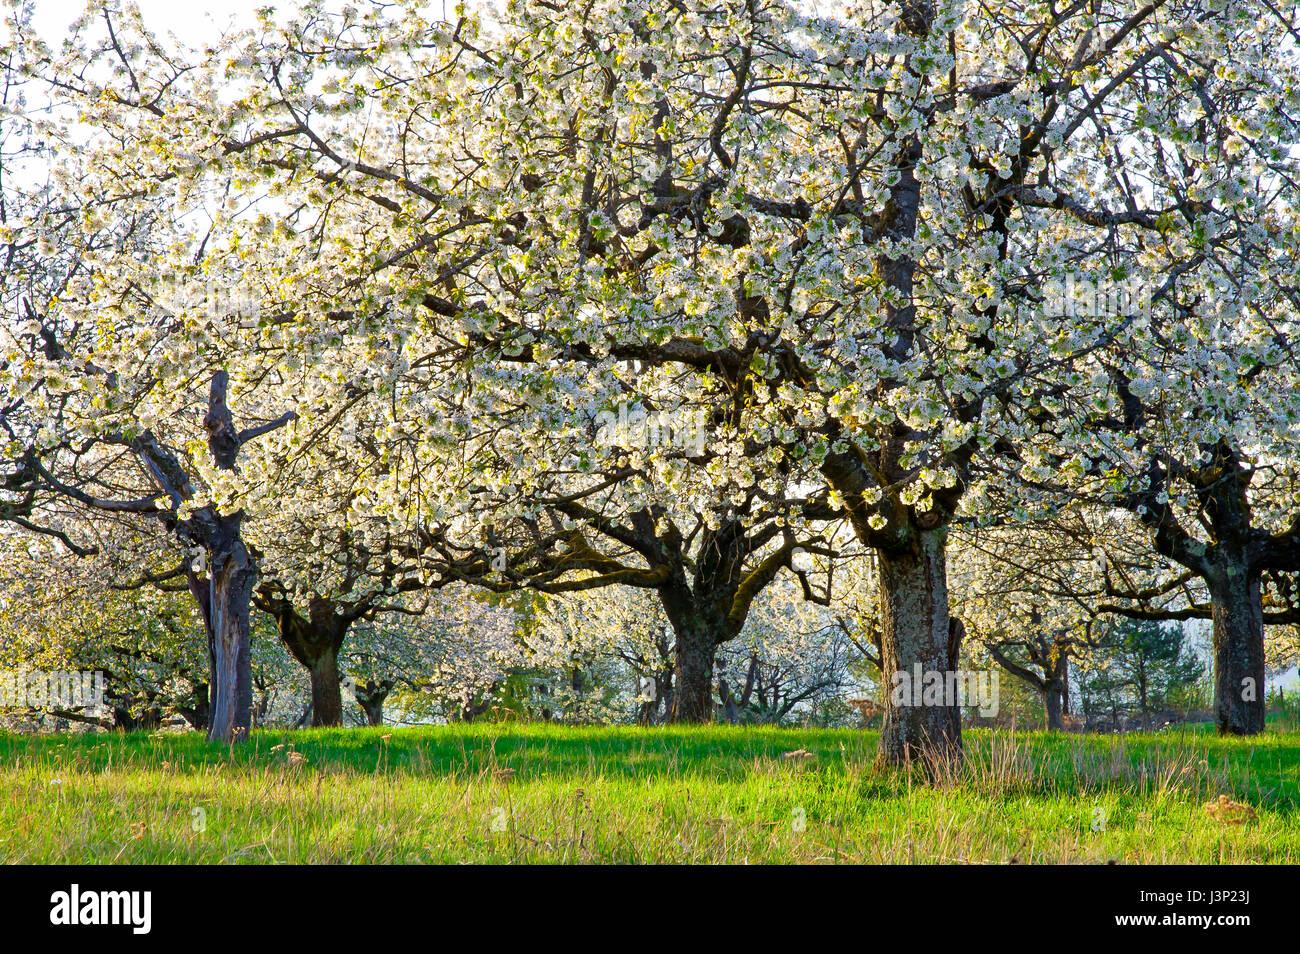 Cherry trees in springtime - Stock Image